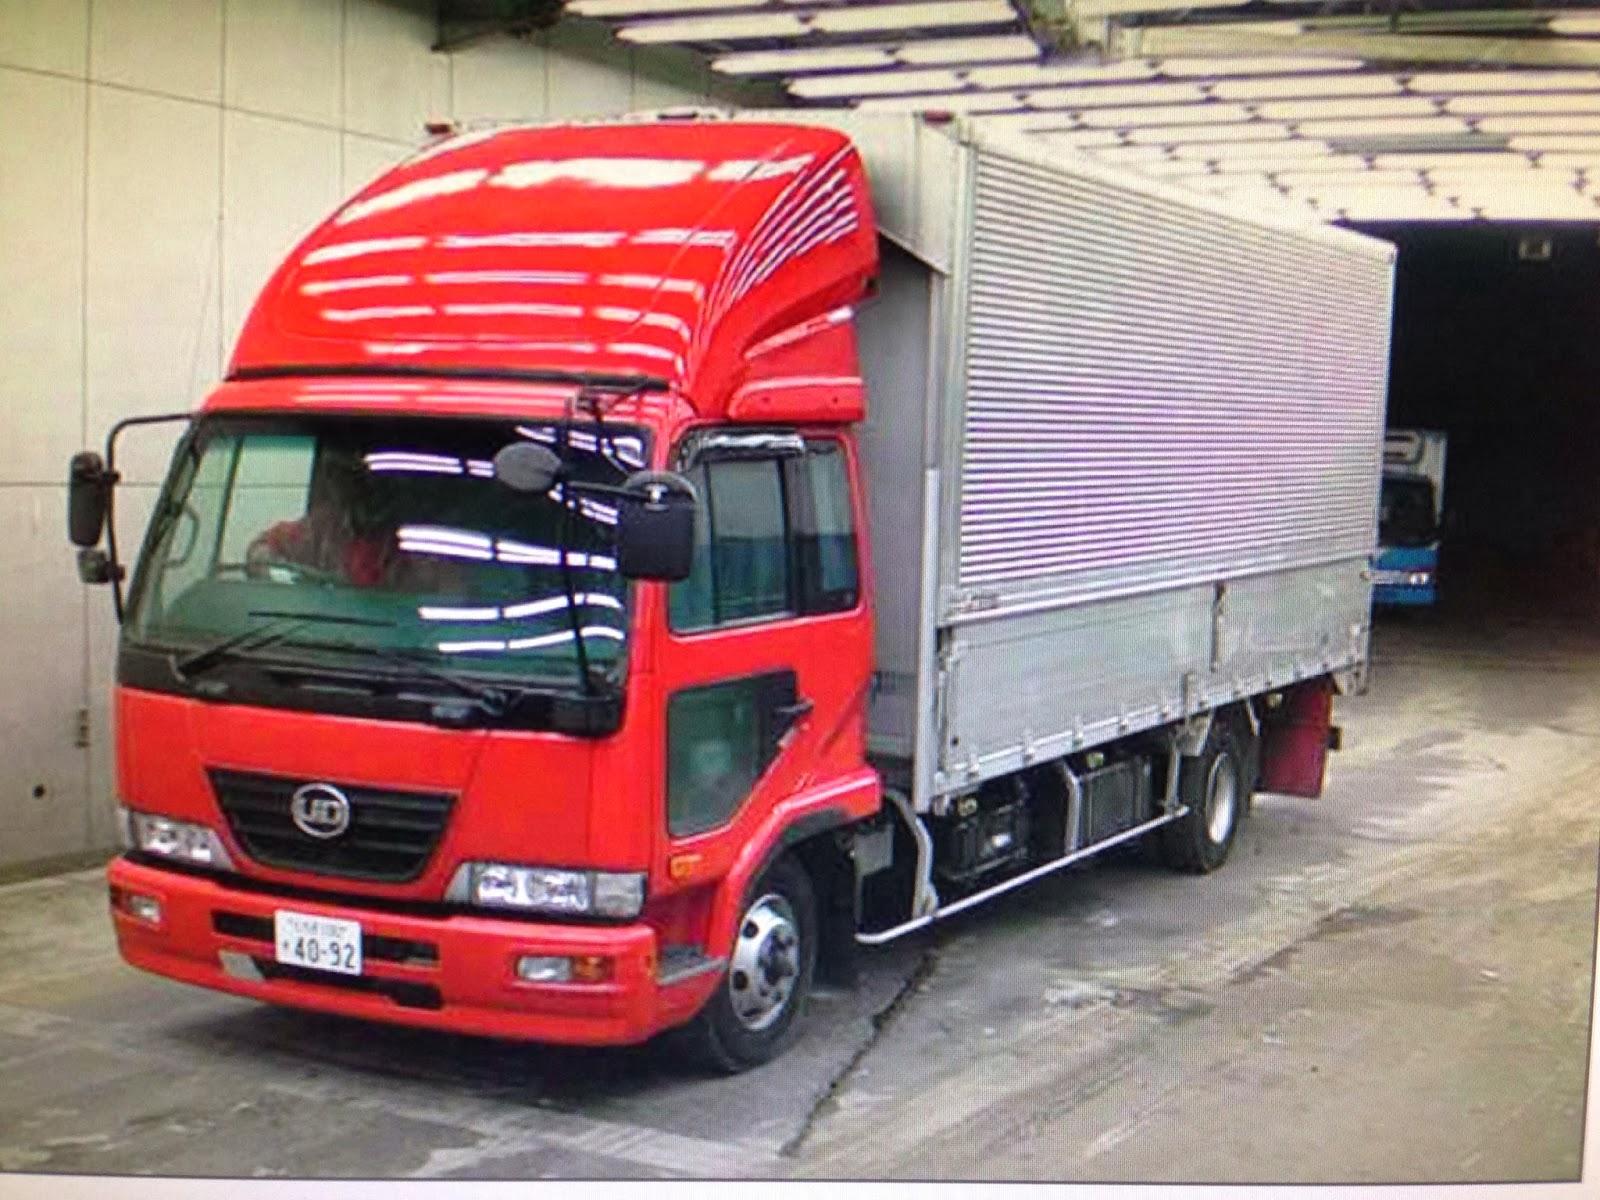 flamante camion nissan condor turbo escenario camiones nissan condor 2008 turbo intercooler. Black Bedroom Furniture Sets. Home Design Ideas